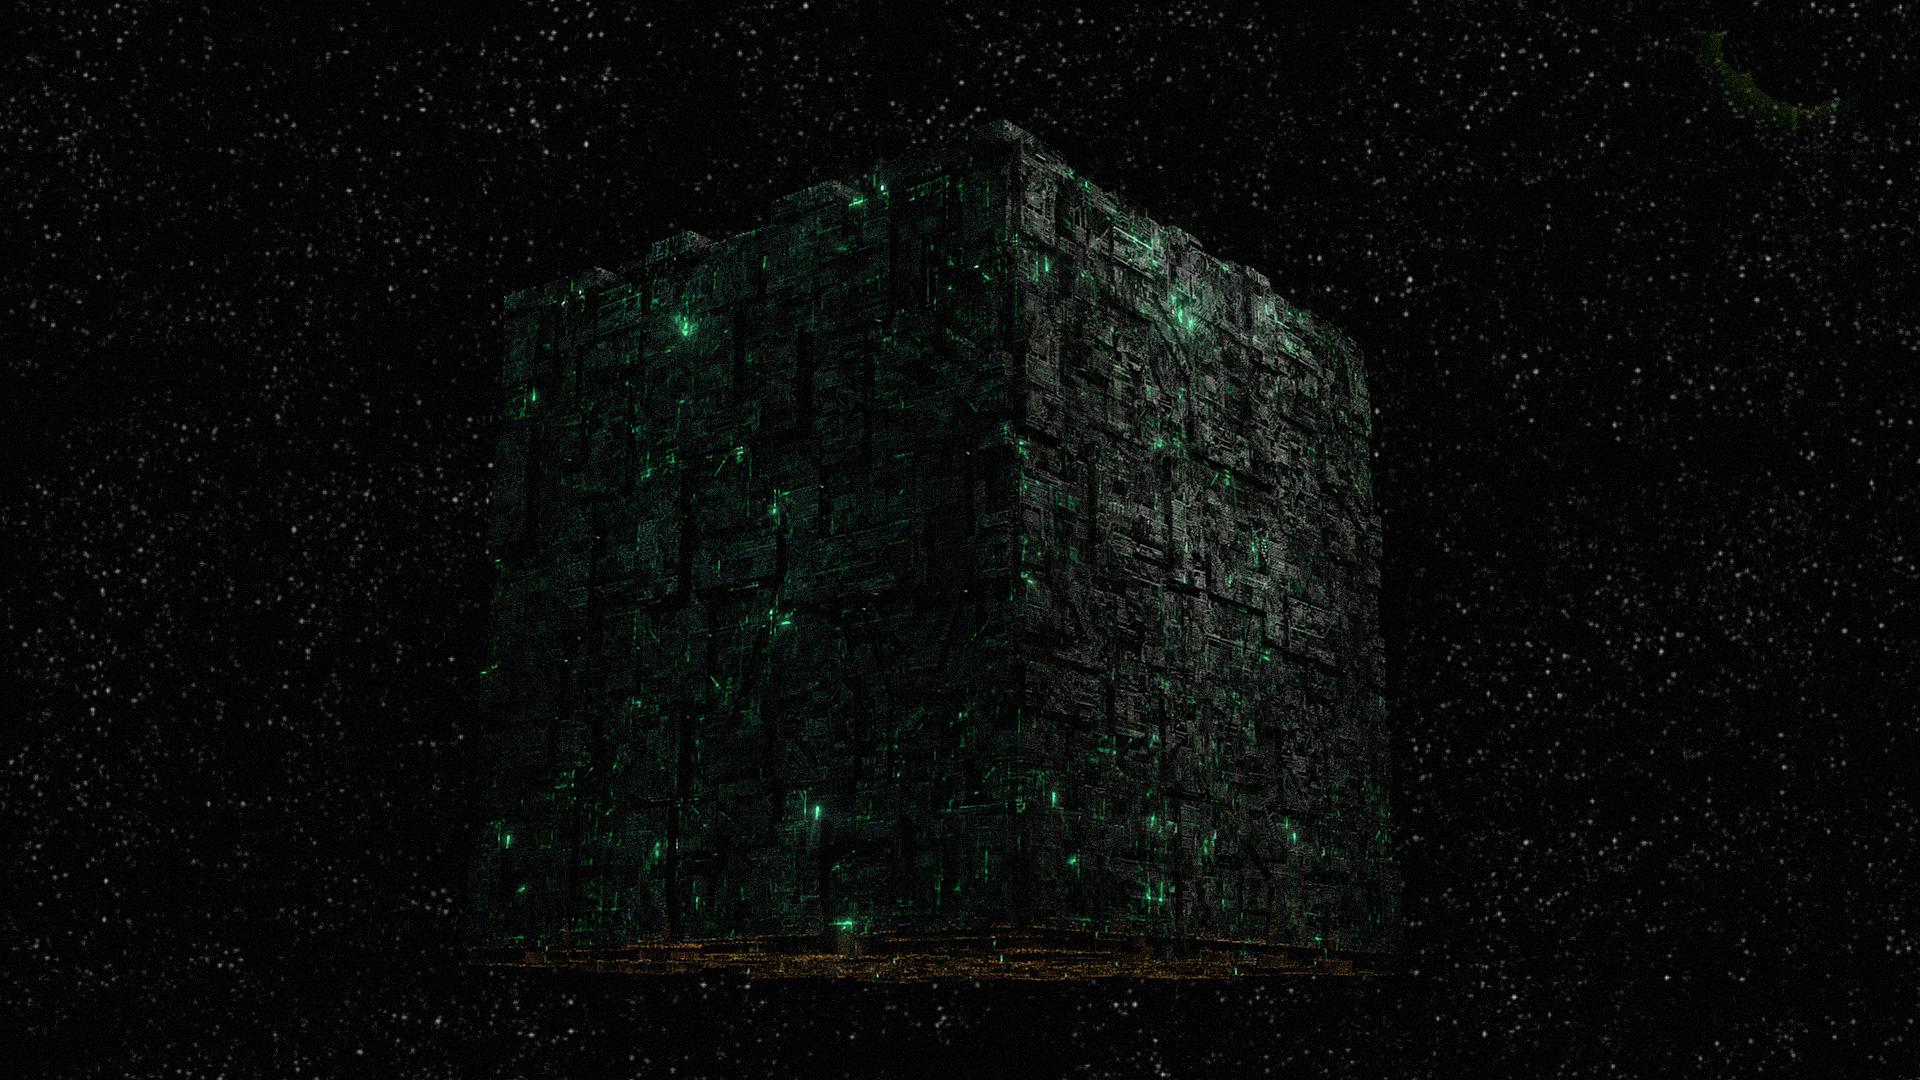 46] Borg Wallpaper Images on WallpaperSafari 1920x1080